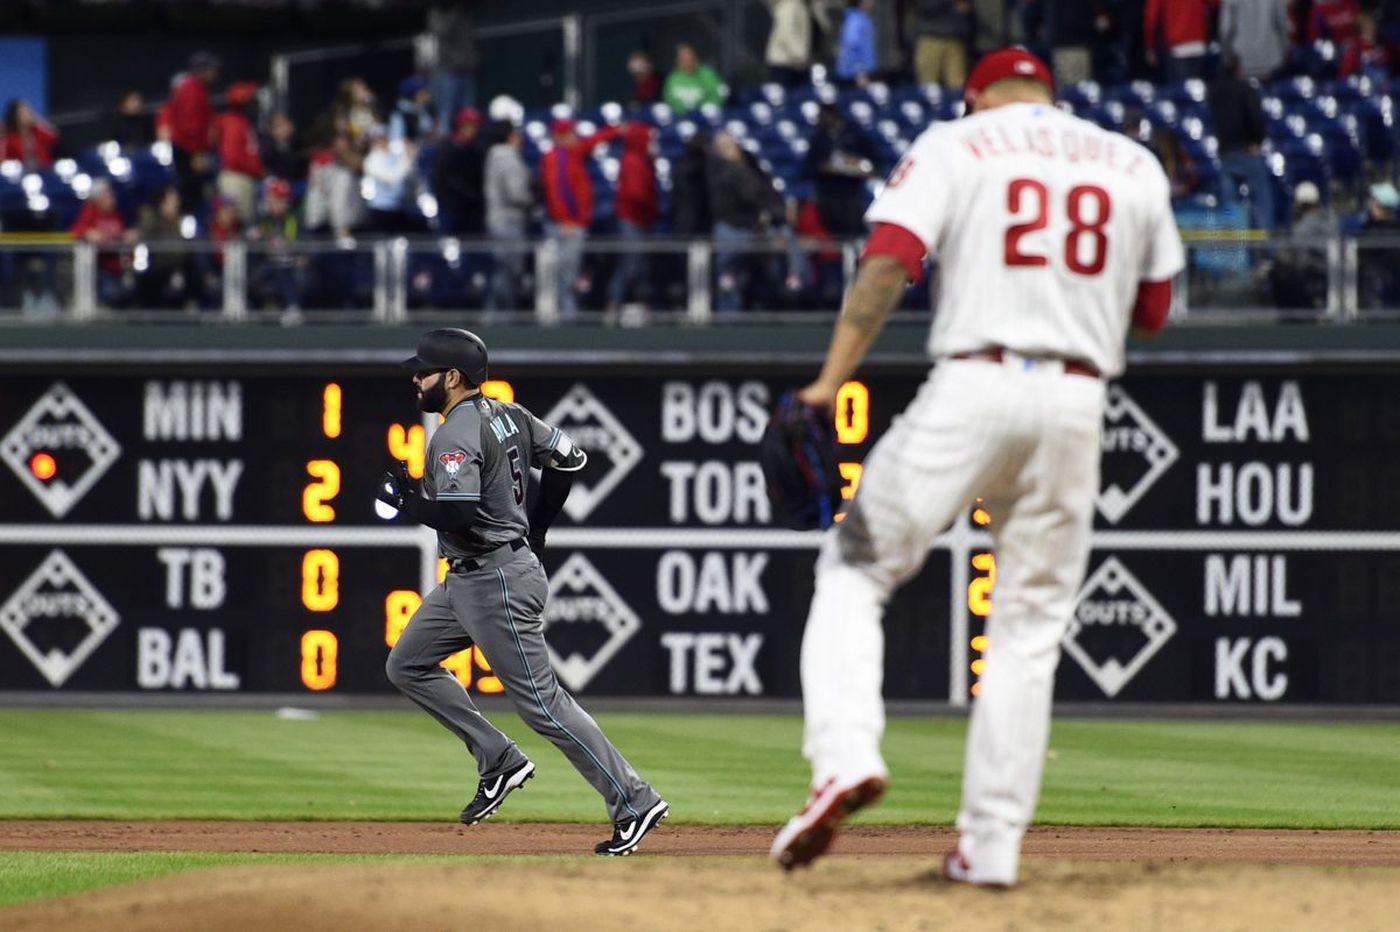 Phillies fall to Diamondbacks, strike out 16 times in rain-soaked loss